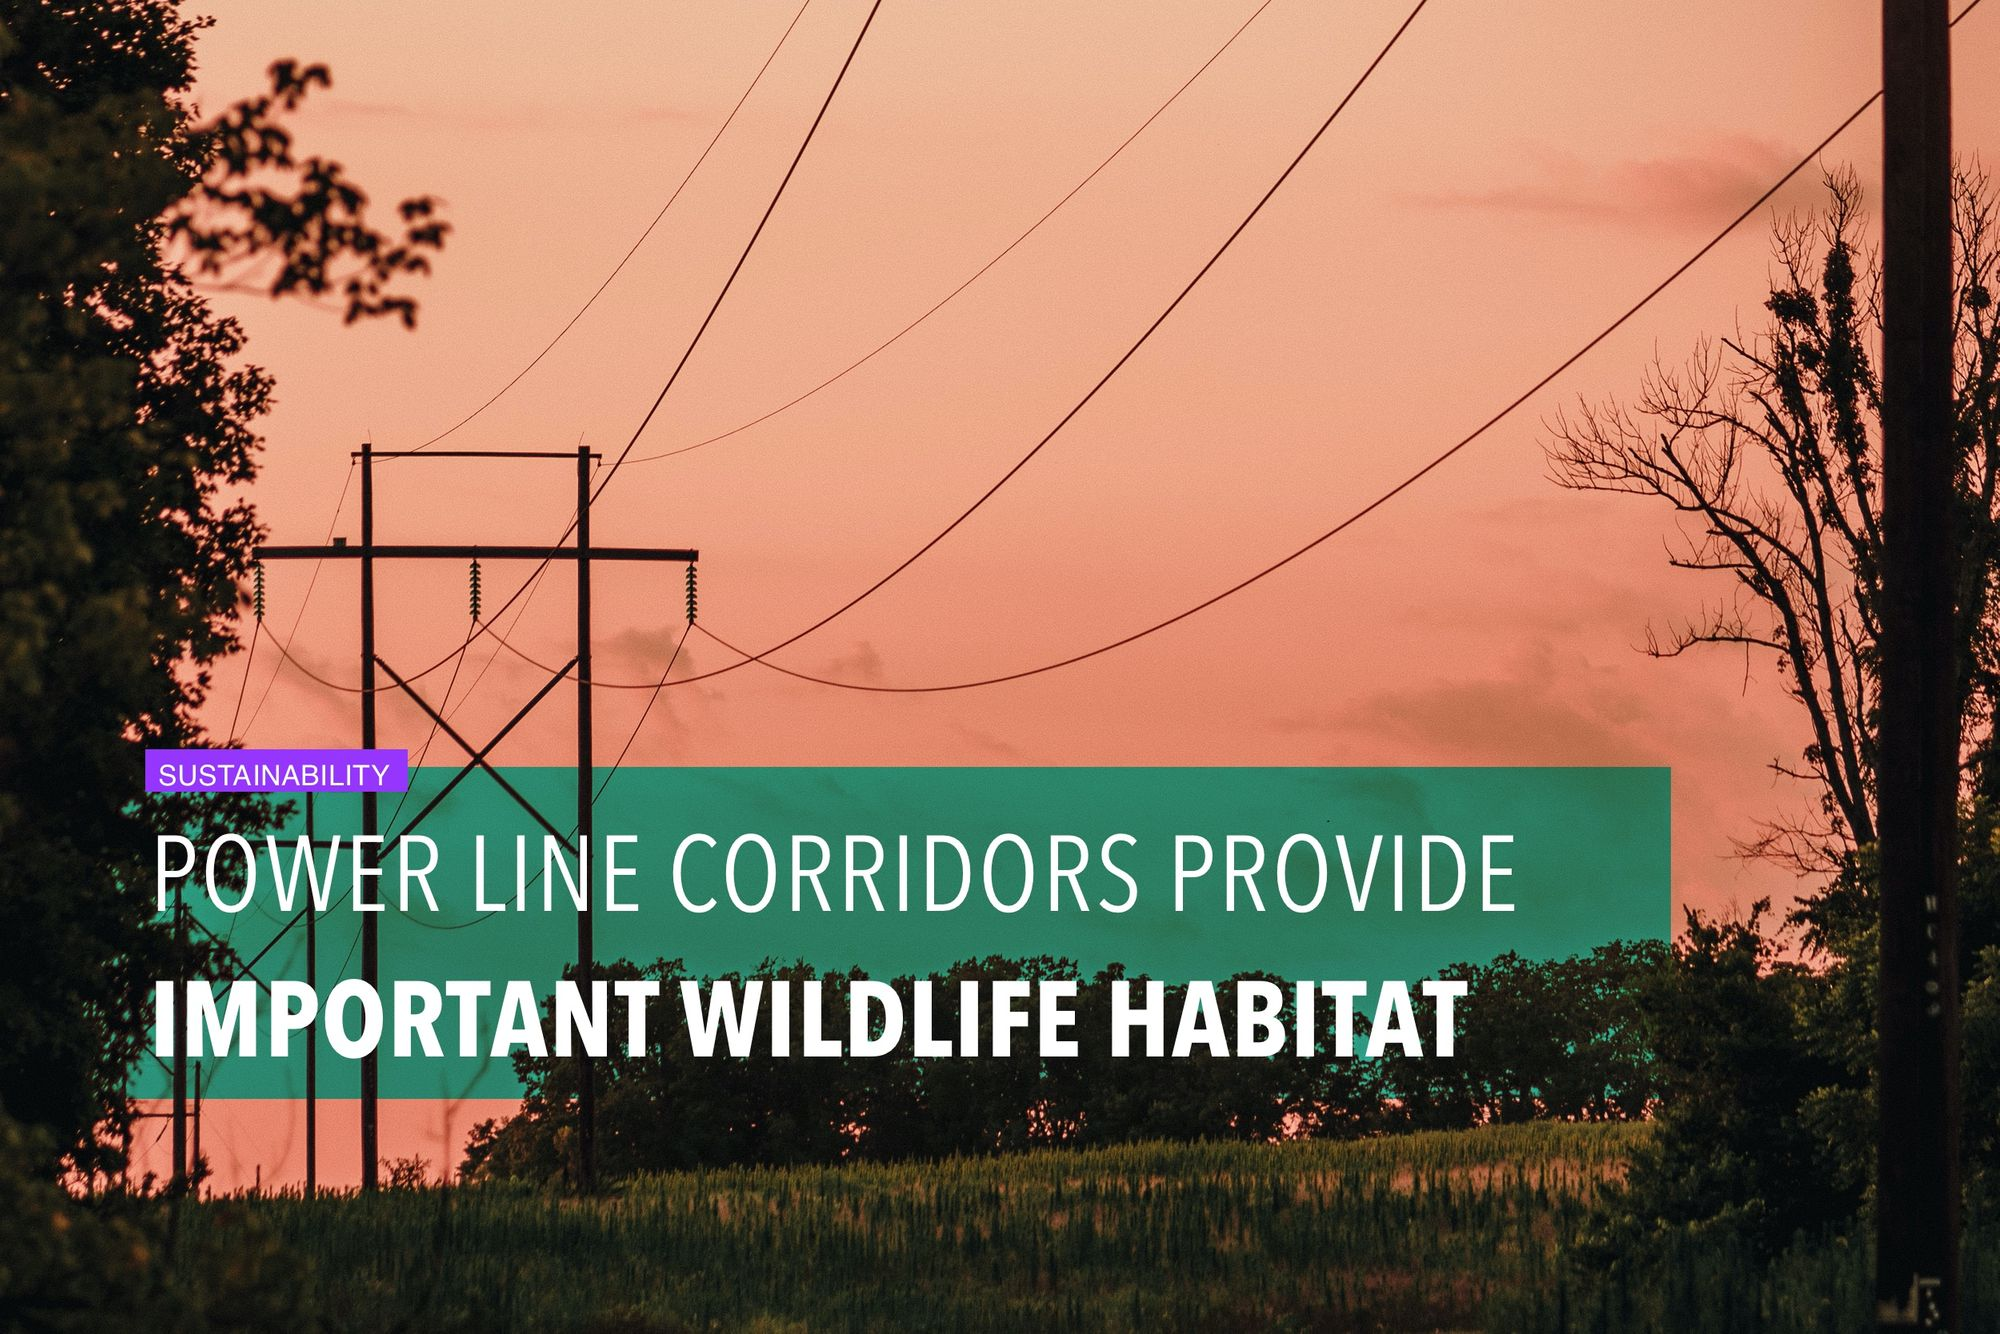 Power line corridors provide important wildlife habitat